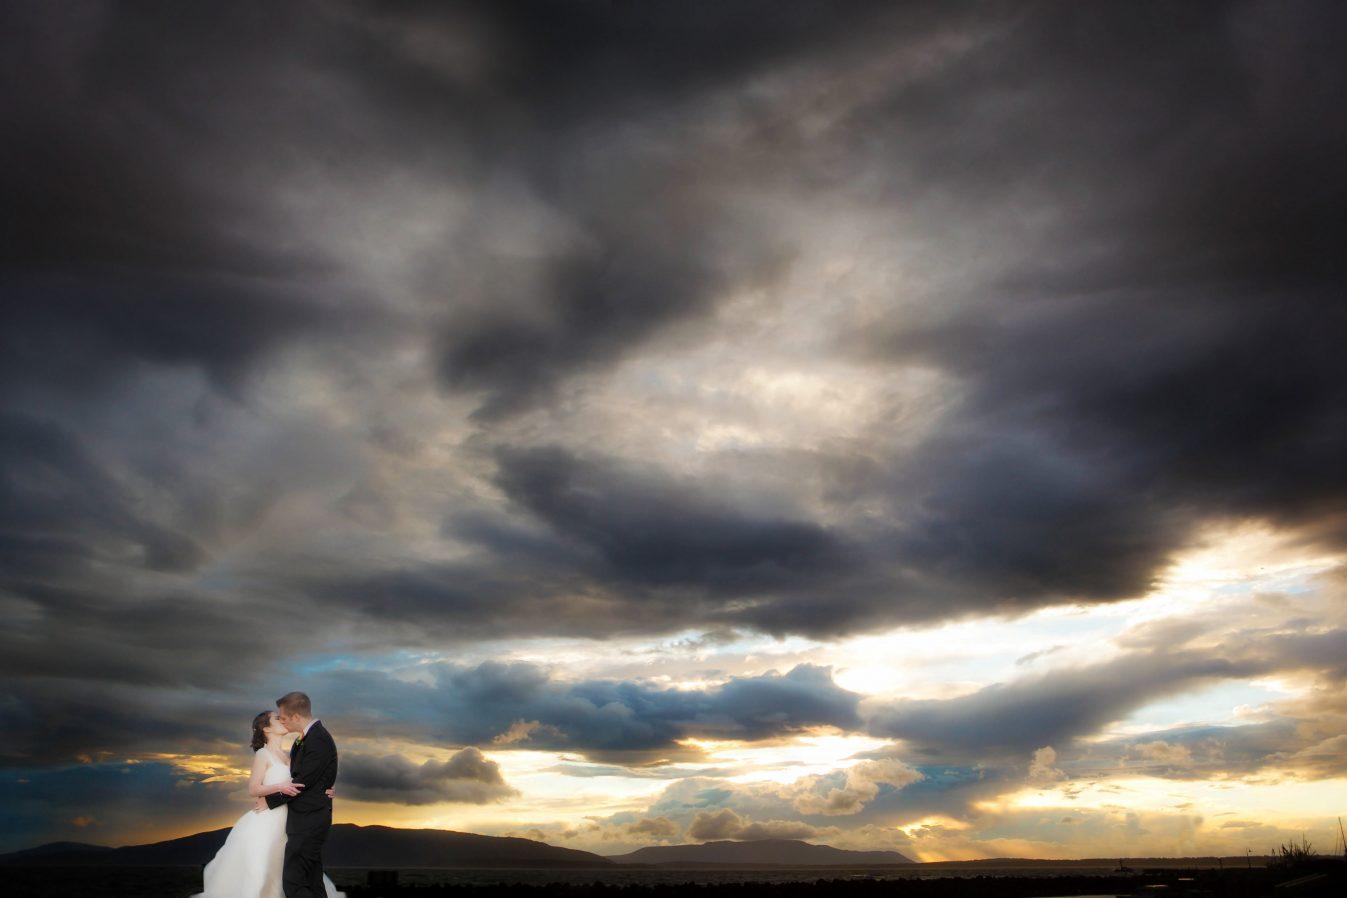 bellingham-sunset-with-bride-groom-bellwether-hotel-wedding-photo